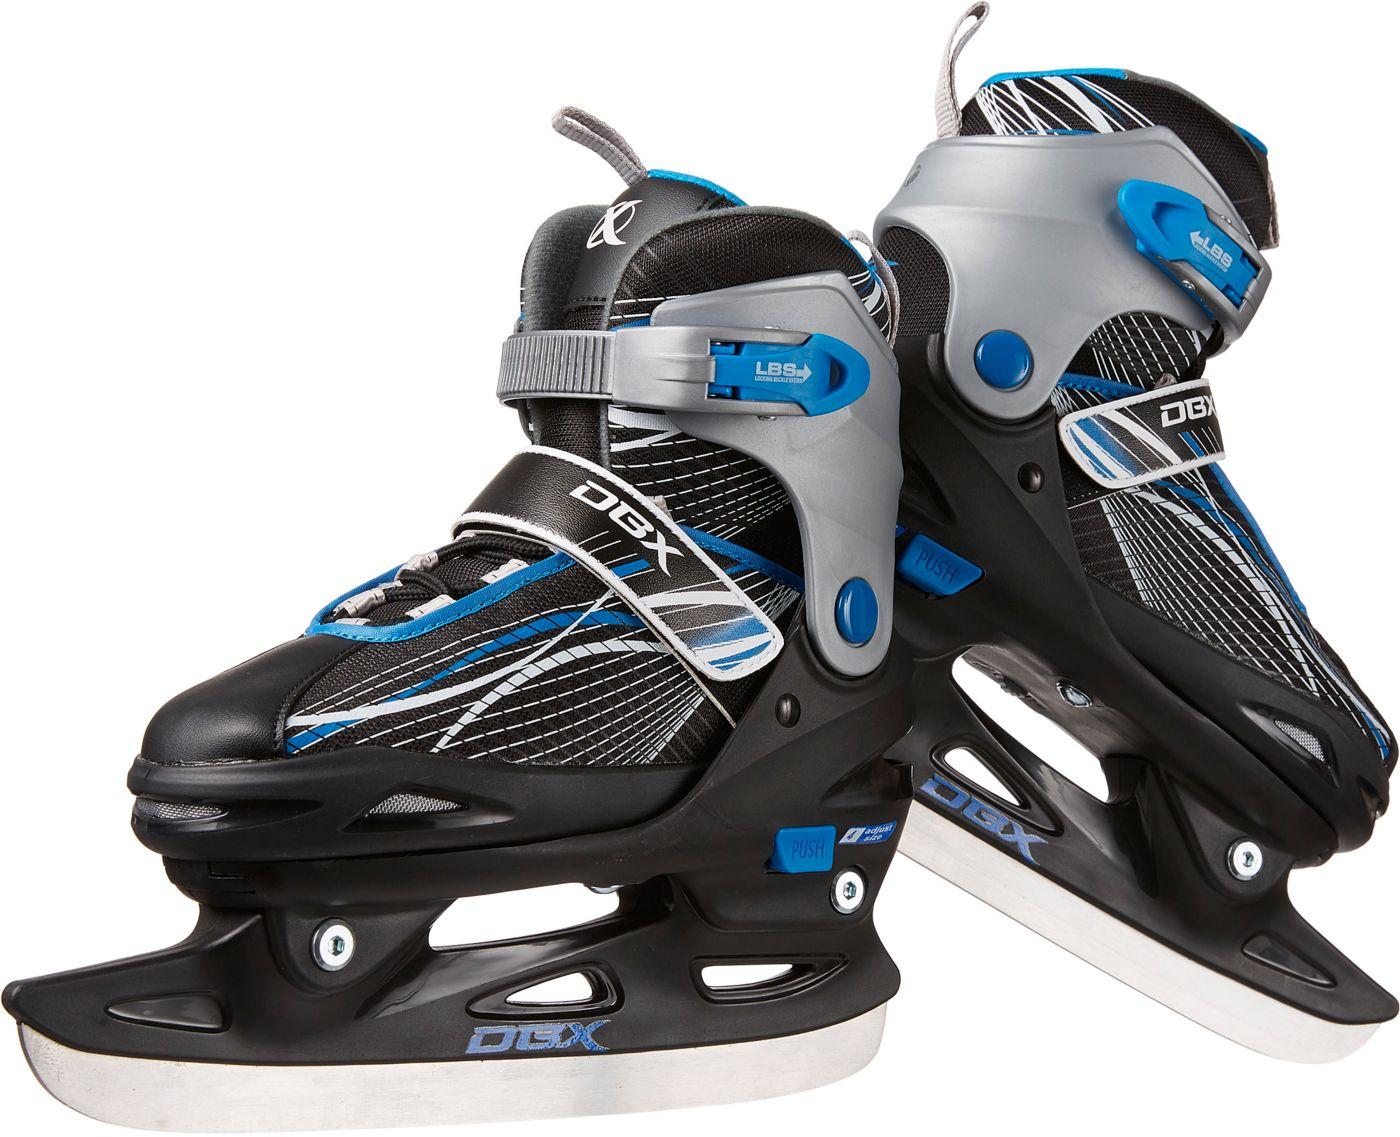 DBX Boy's Adjustable Ice Skates